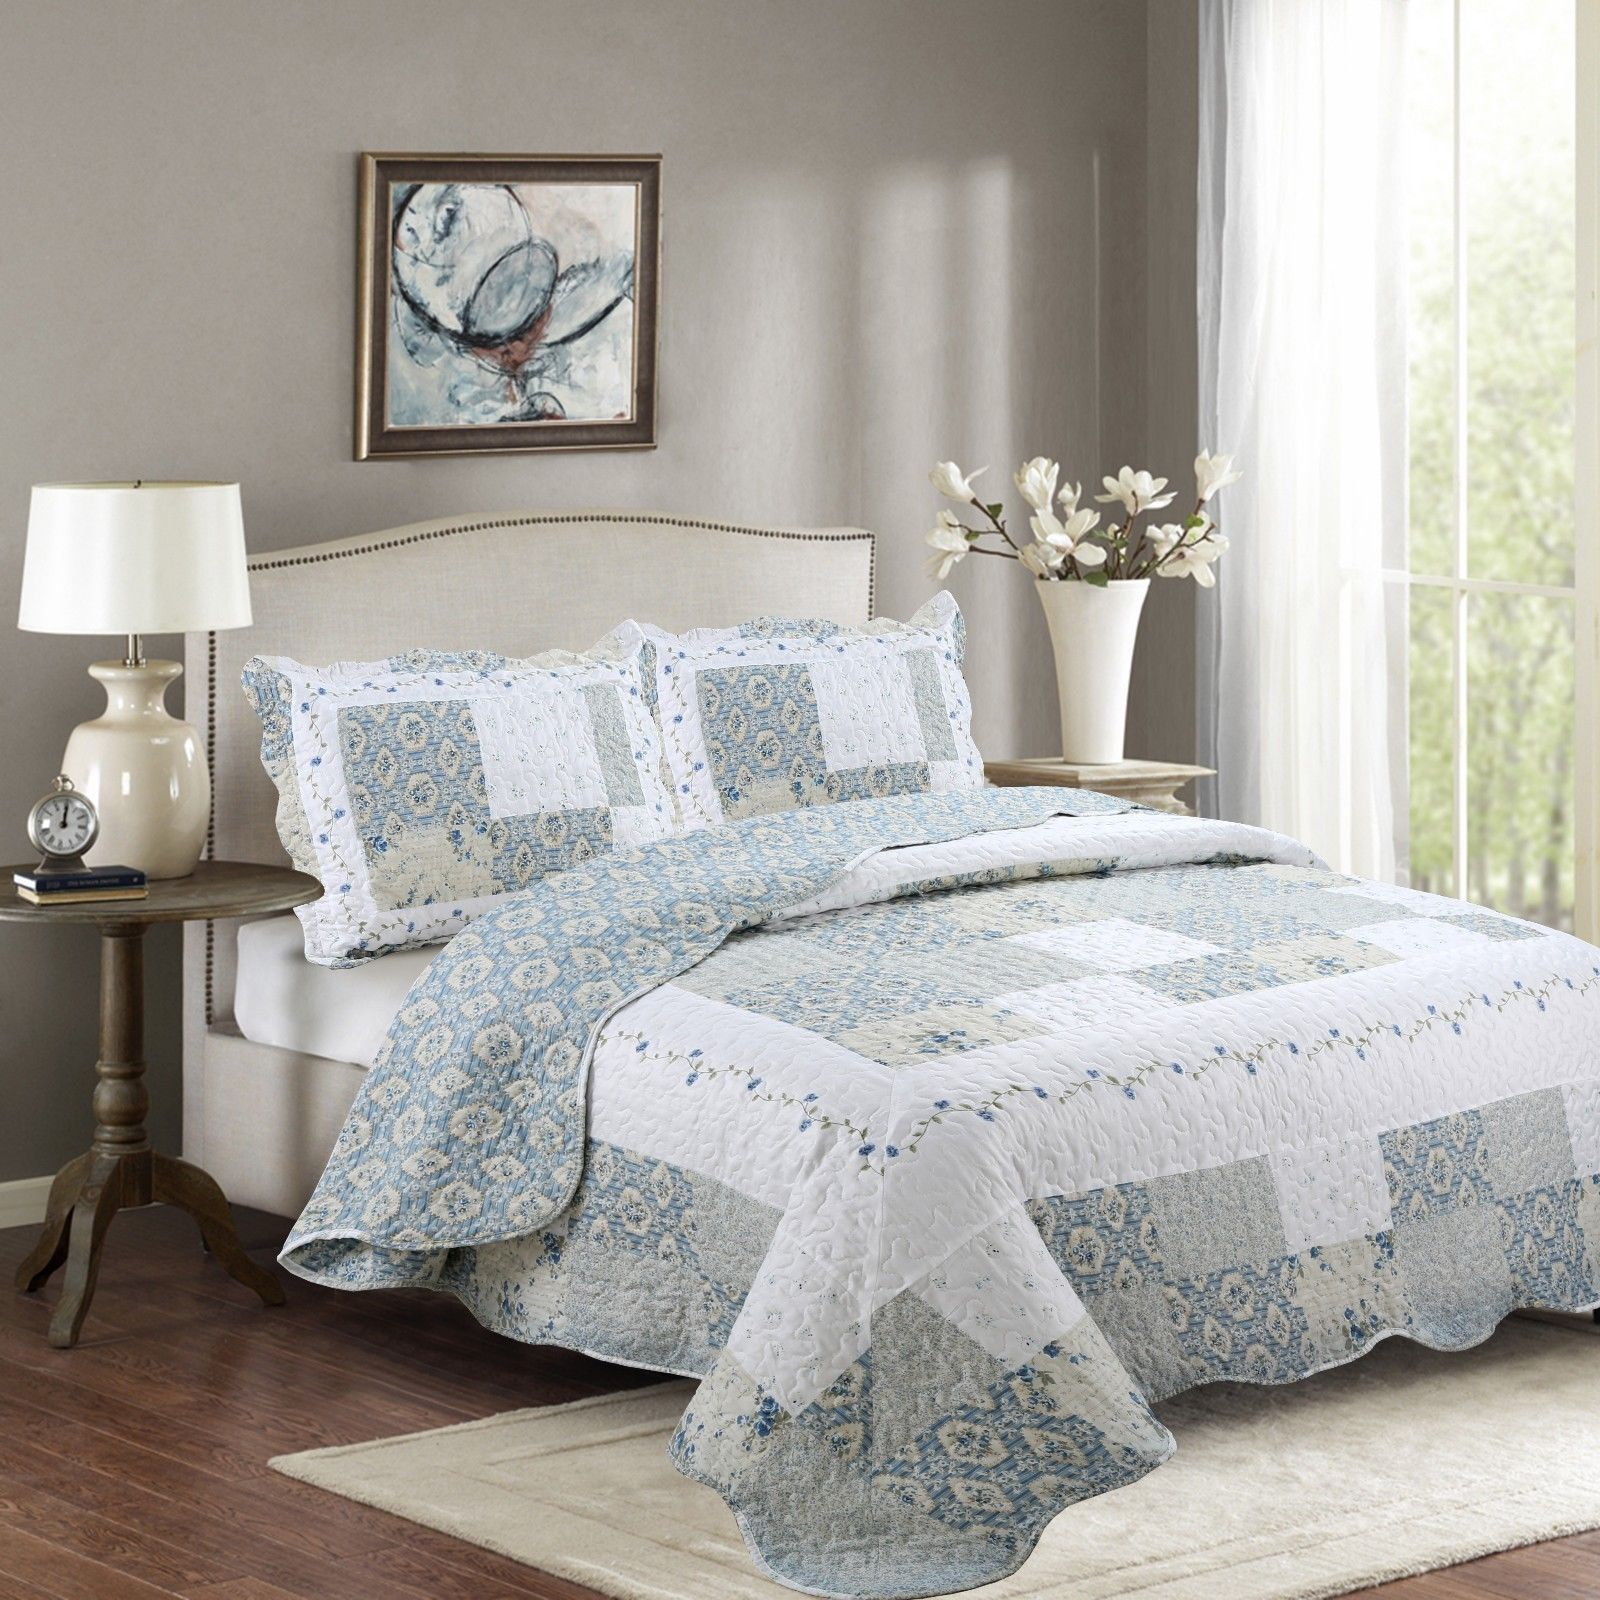 Fancy Linen 2pc Twin Reversible Bedspread Floral White Blue Beige New # Isabelle